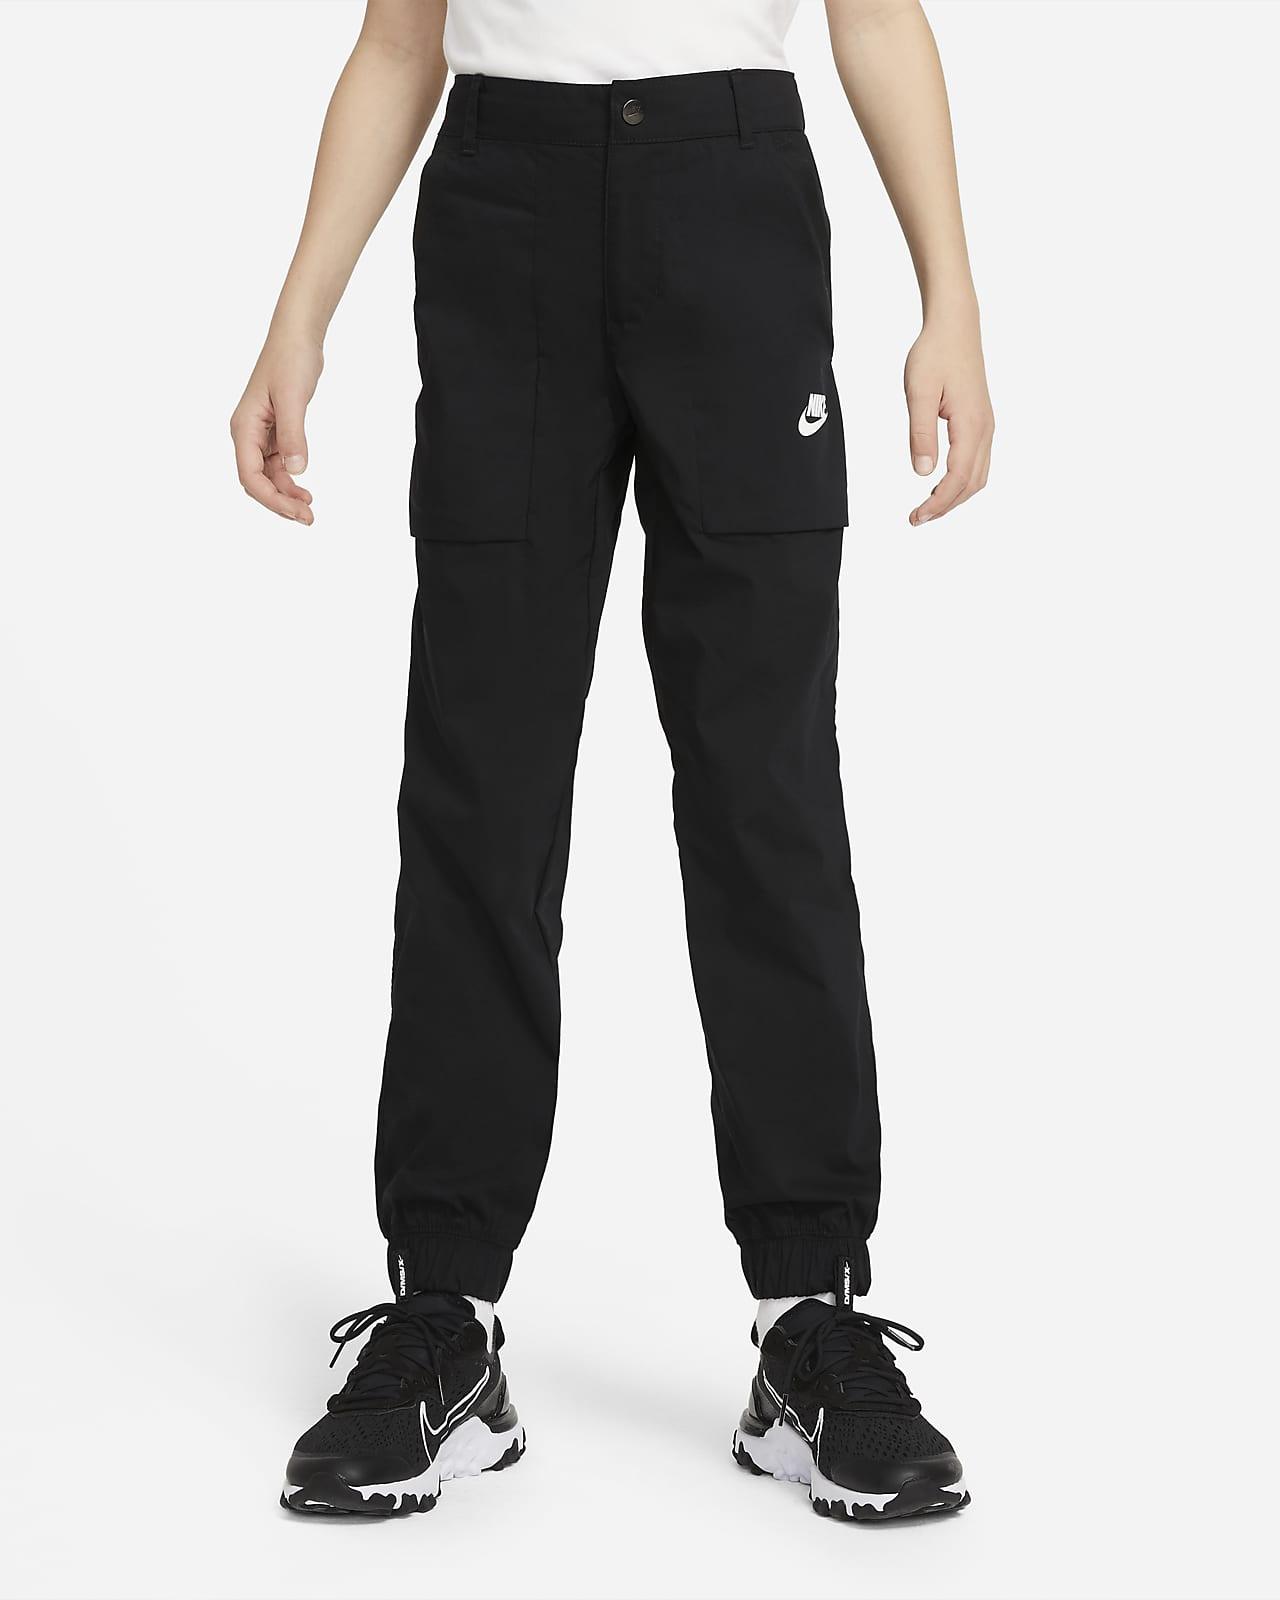 Nike Sportswear gewebte Cargohose für ältere Kinder (Jungen)